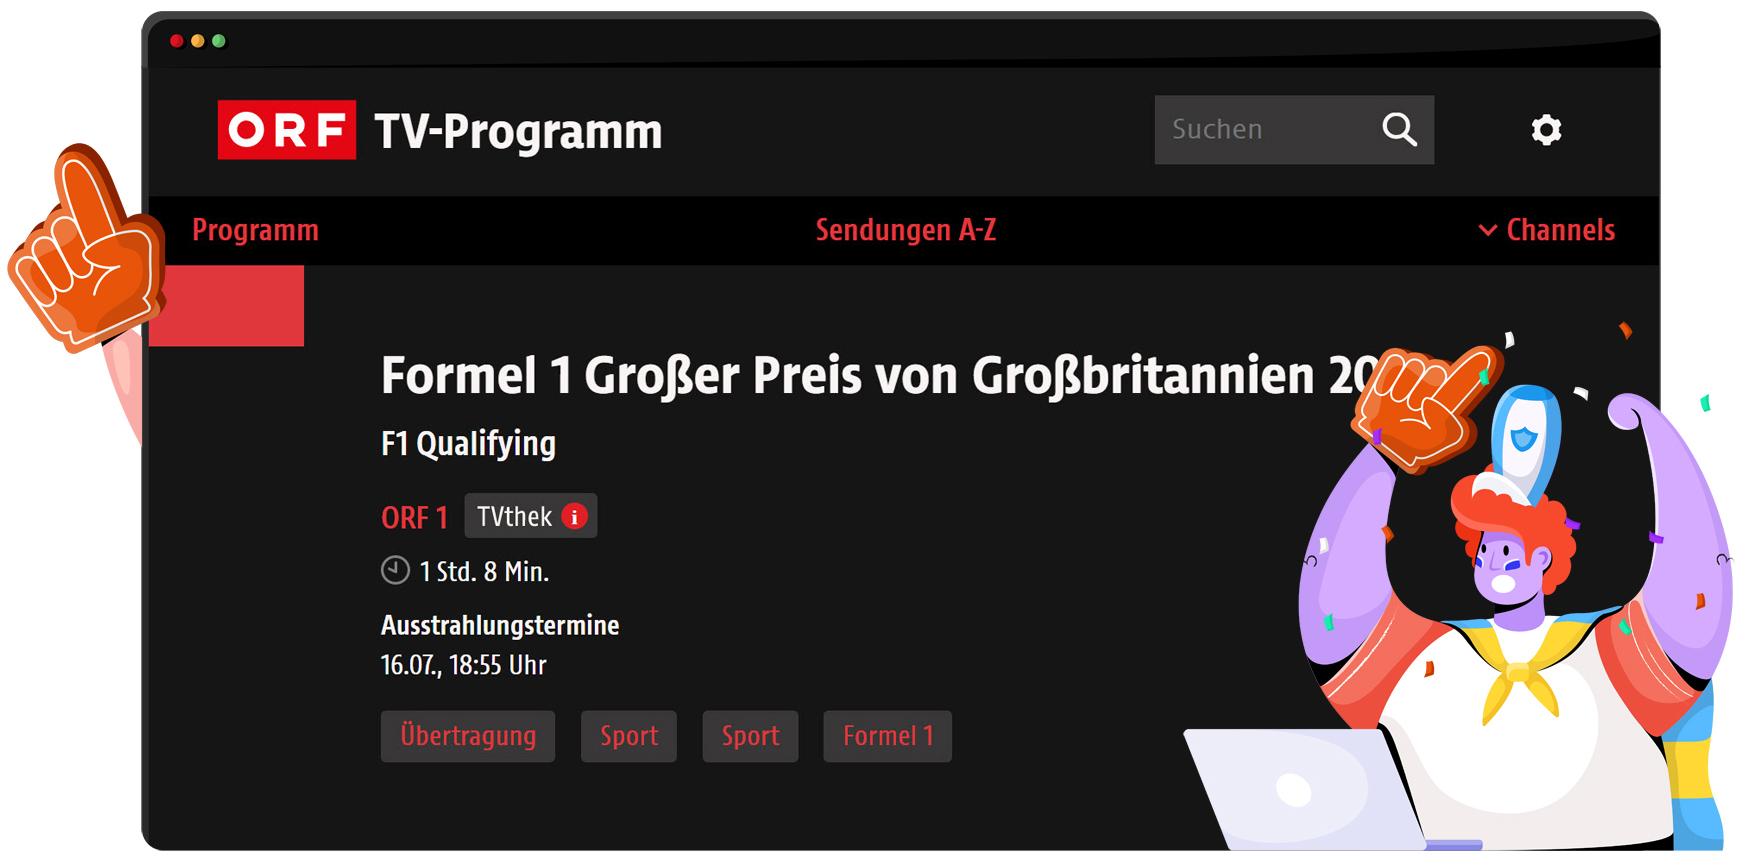 ORF1 ücretsiz Formula 1 akışı